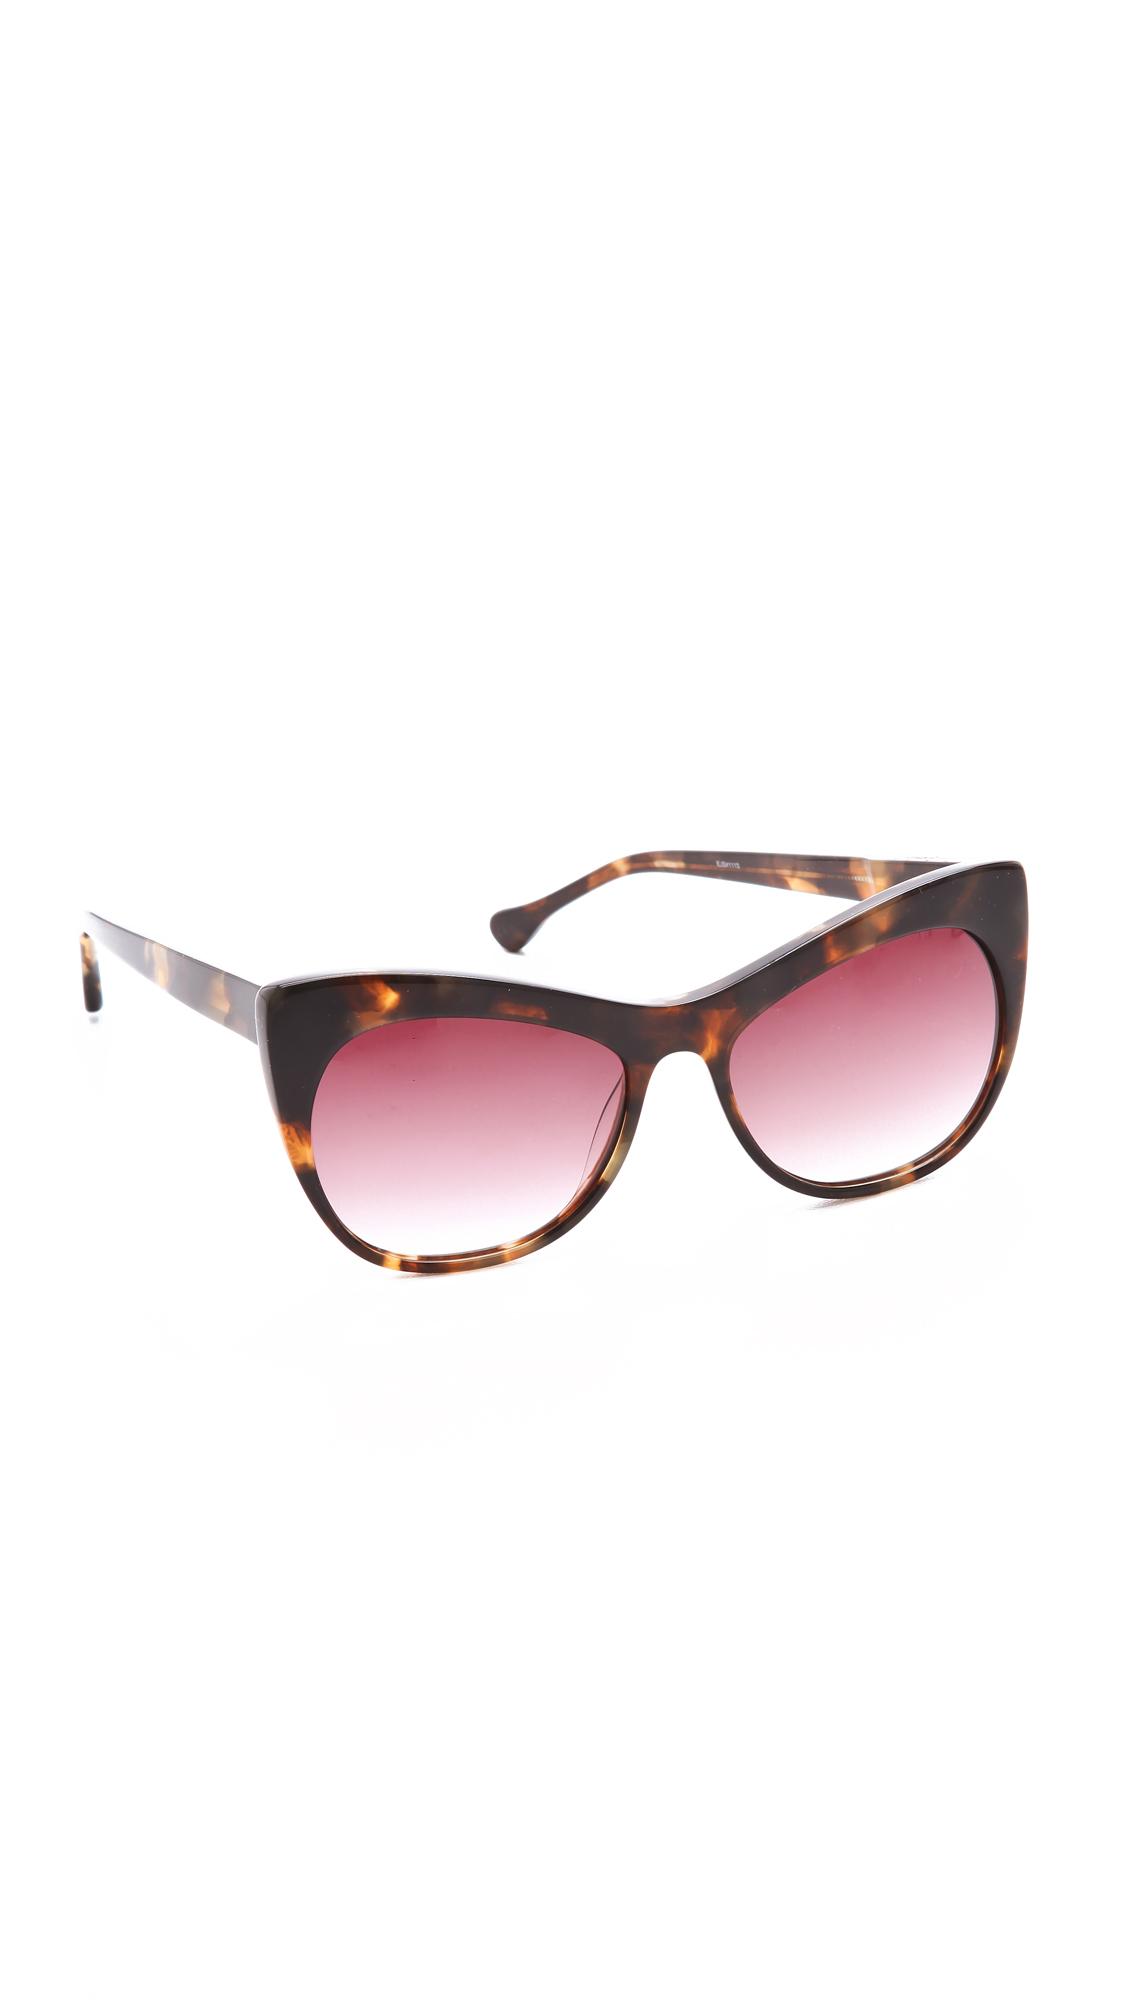 2e02c0759d Elizabeth and James Lafayette Cat Eye Sunglasses